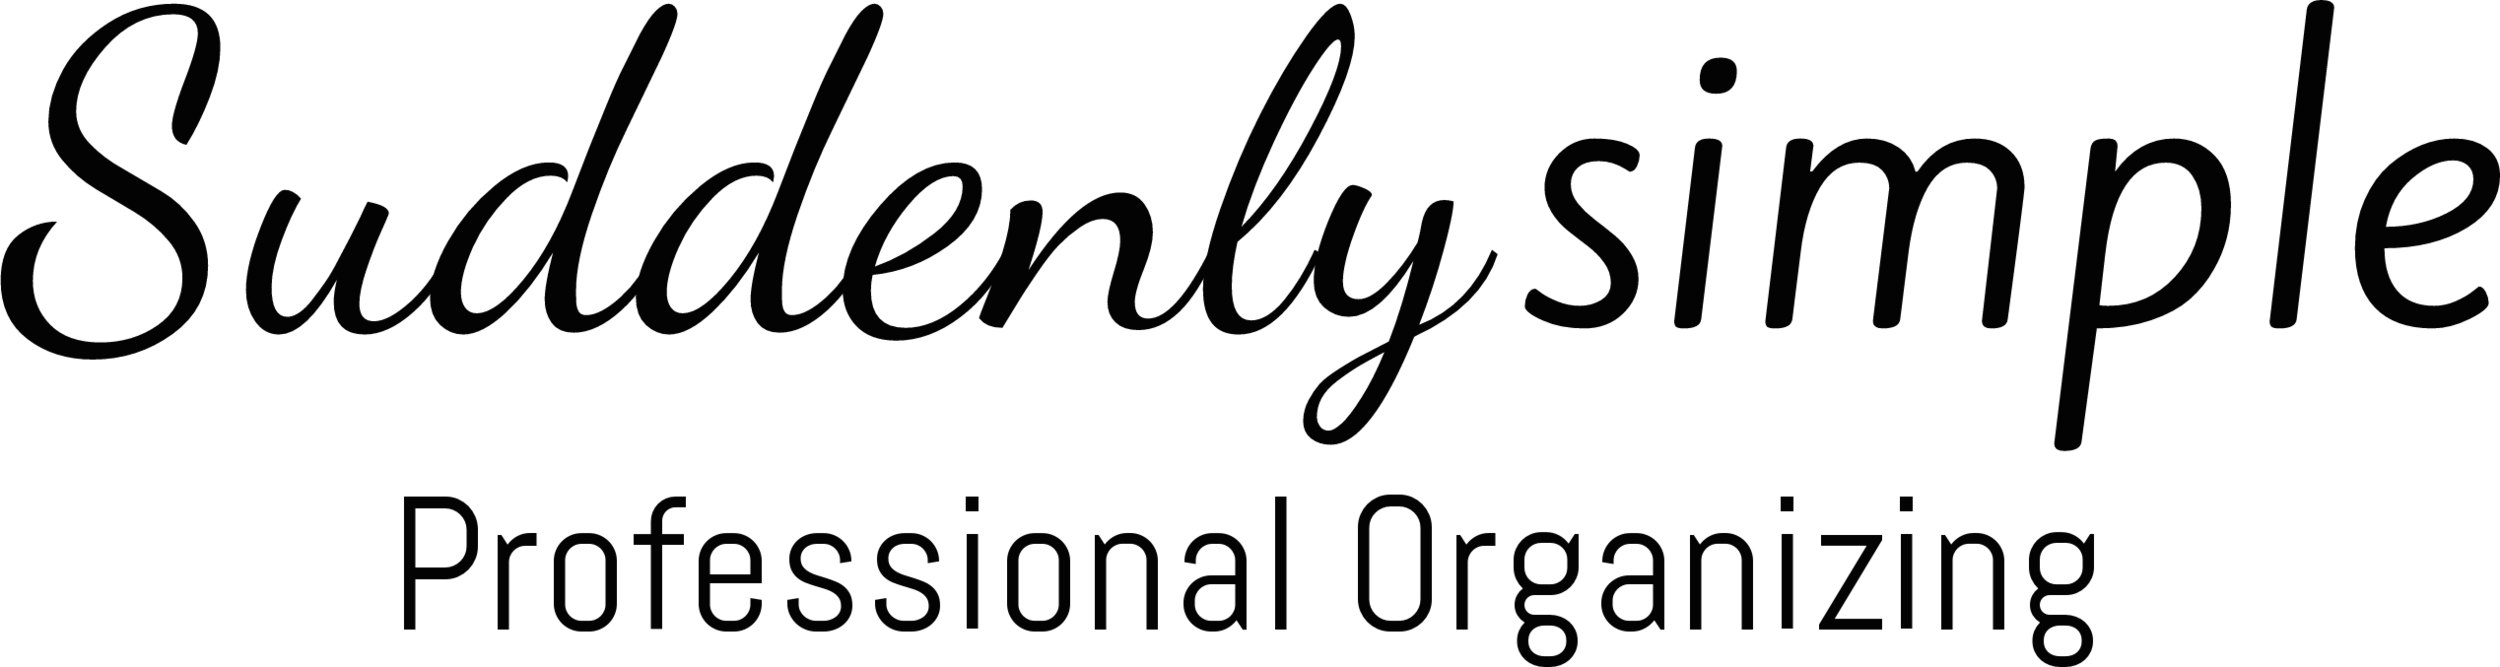 Suddenly Simple Professional Organizing black logo.